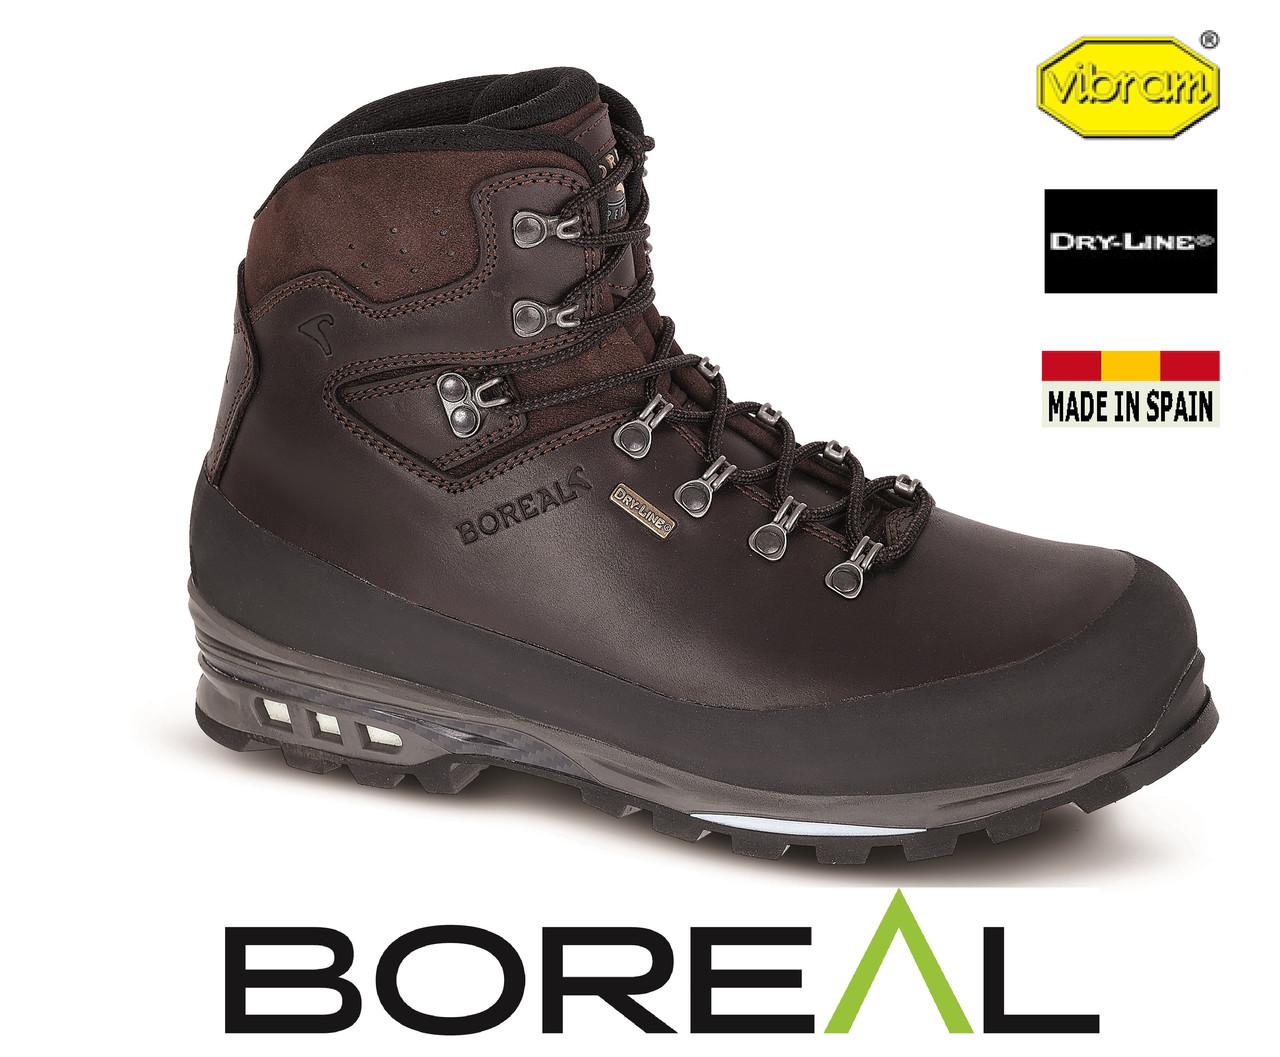 Ботинки для треккинга Boreal Zanskar Full-Grain.